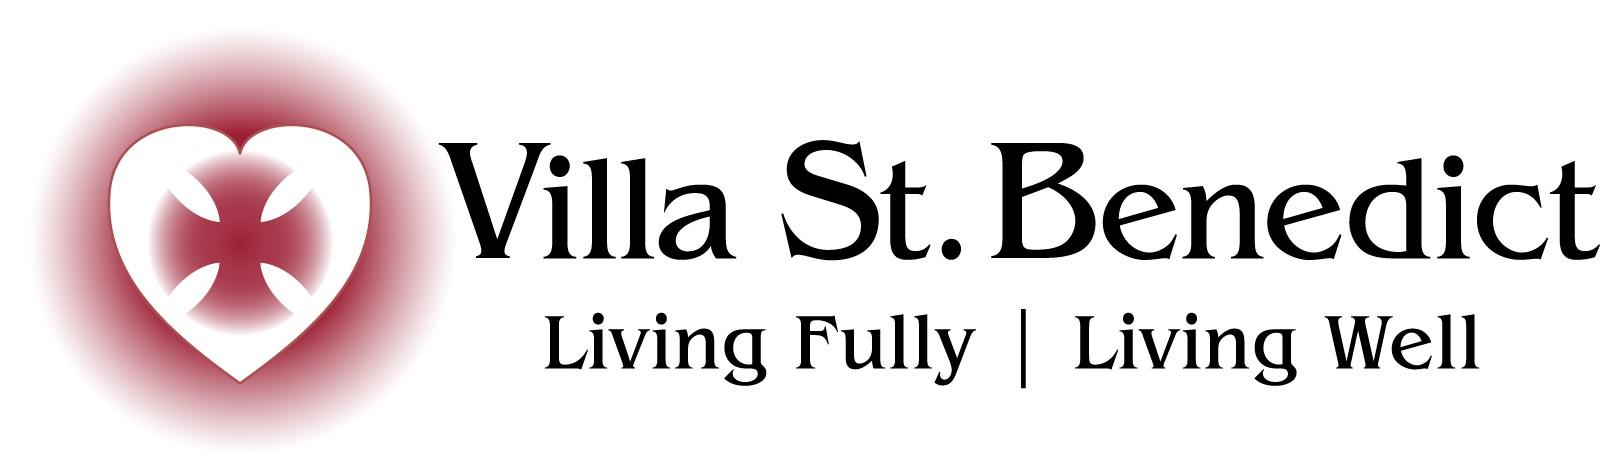 Villa St. Benedict Company Logo